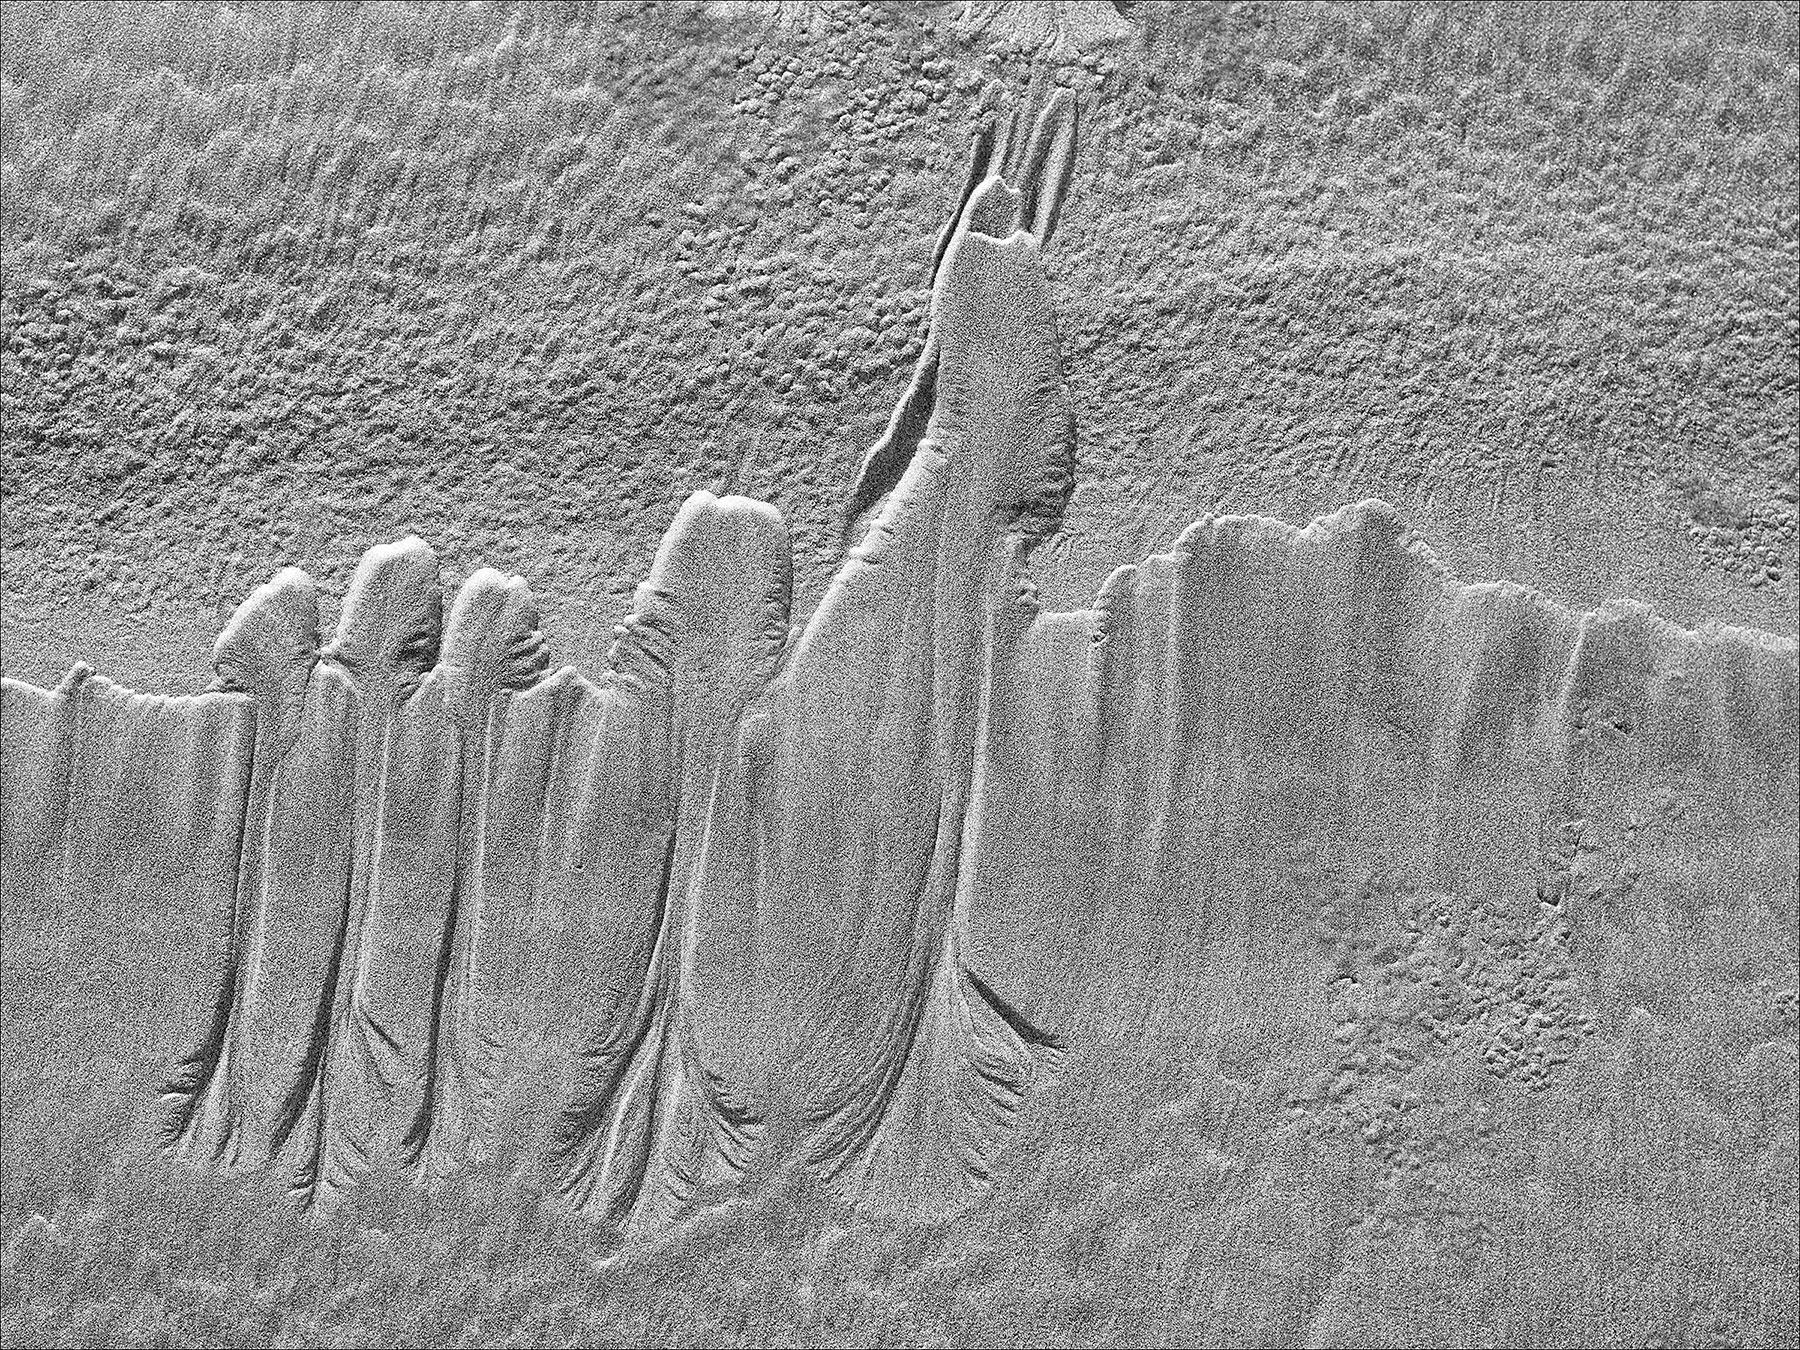 The Wall © johncameron.ca